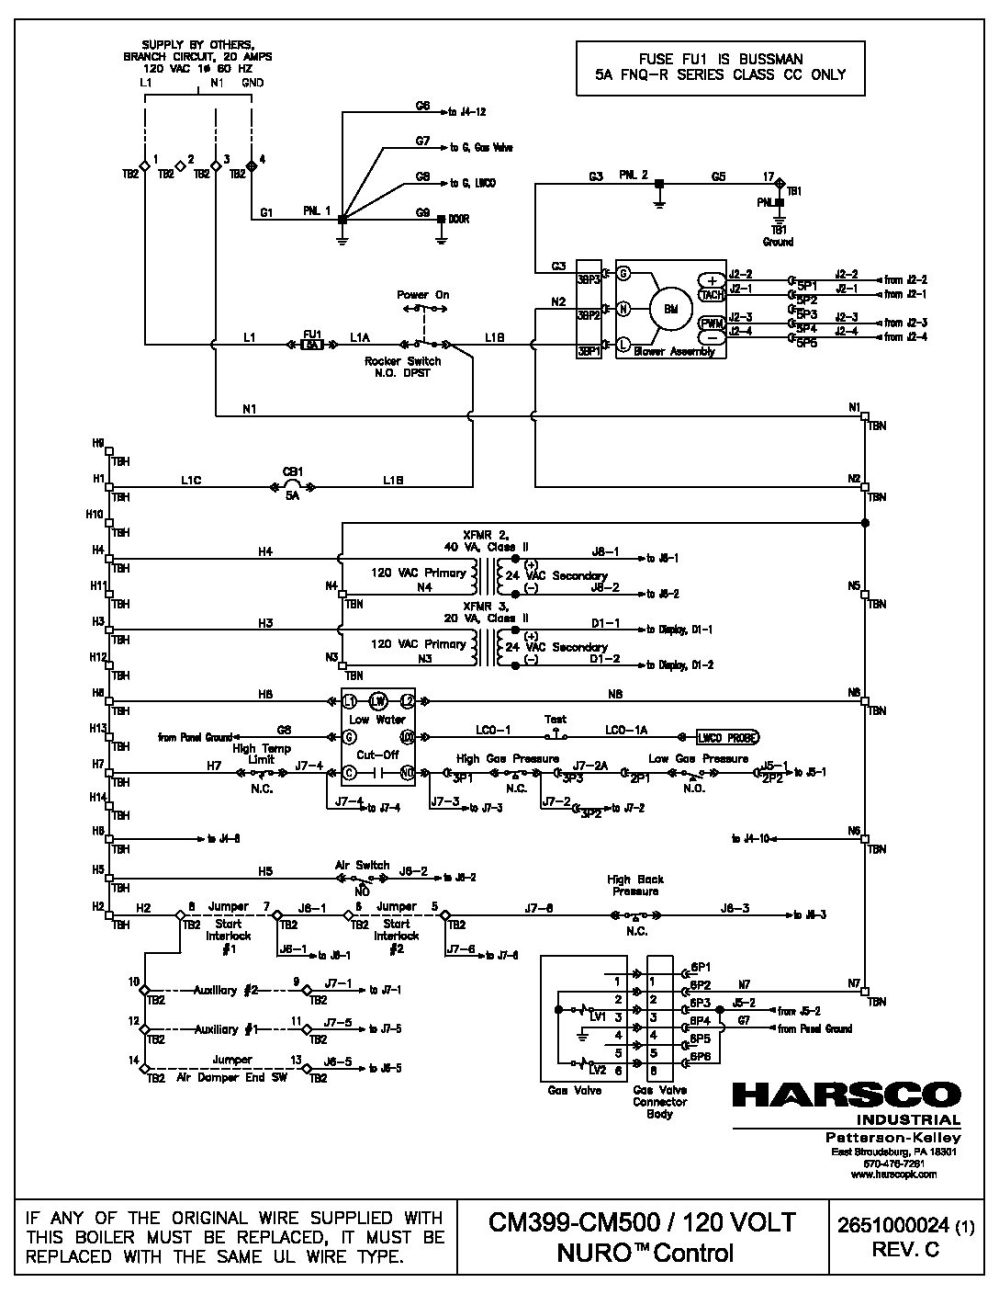 medium resolution of cm399 cm500 nuro wiring rev c